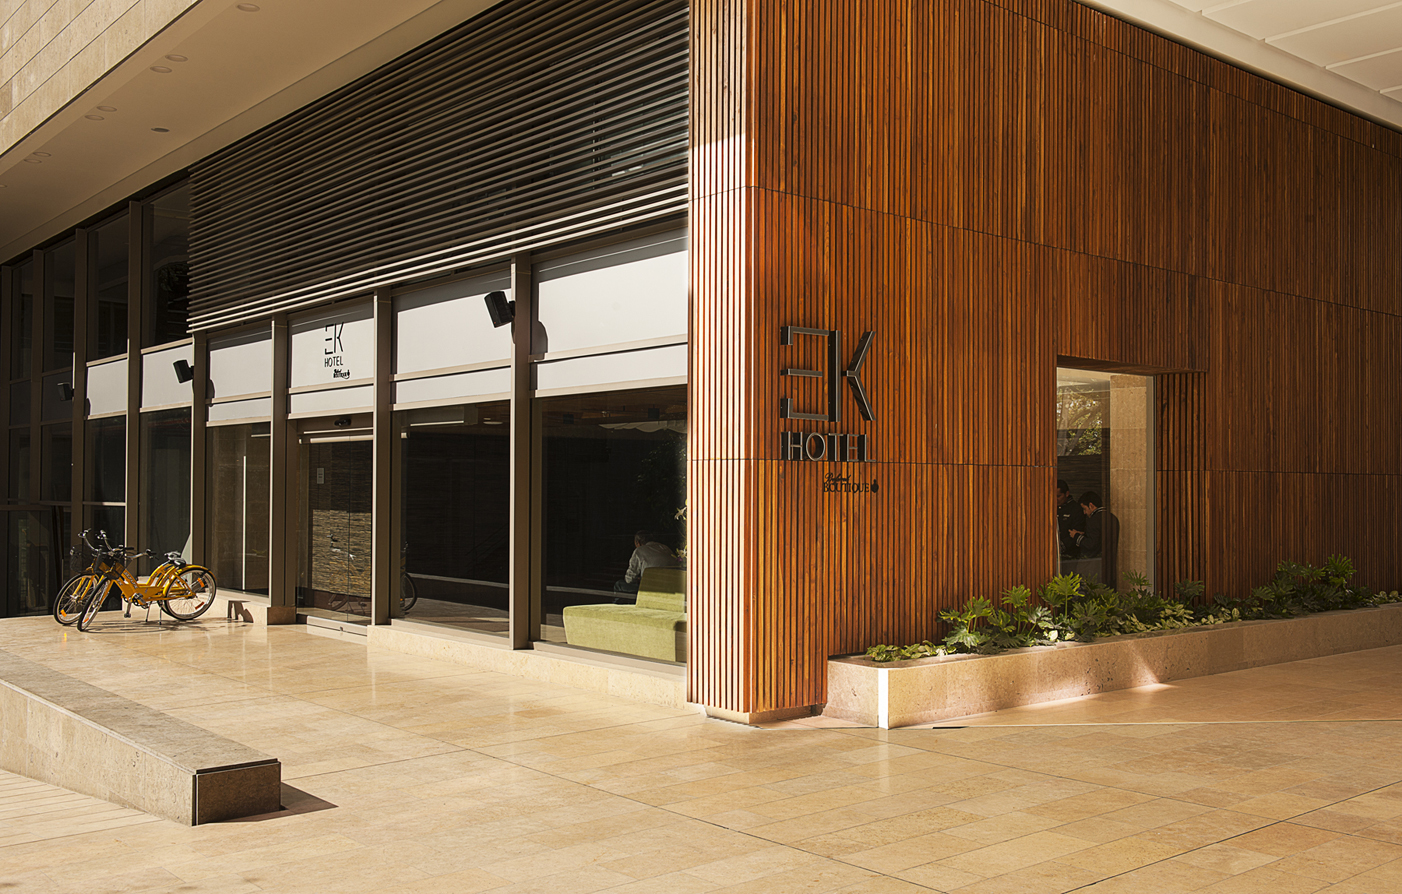 Bogota hotels ek hotel luxury bogota hotels for Hotel design 100 bogota